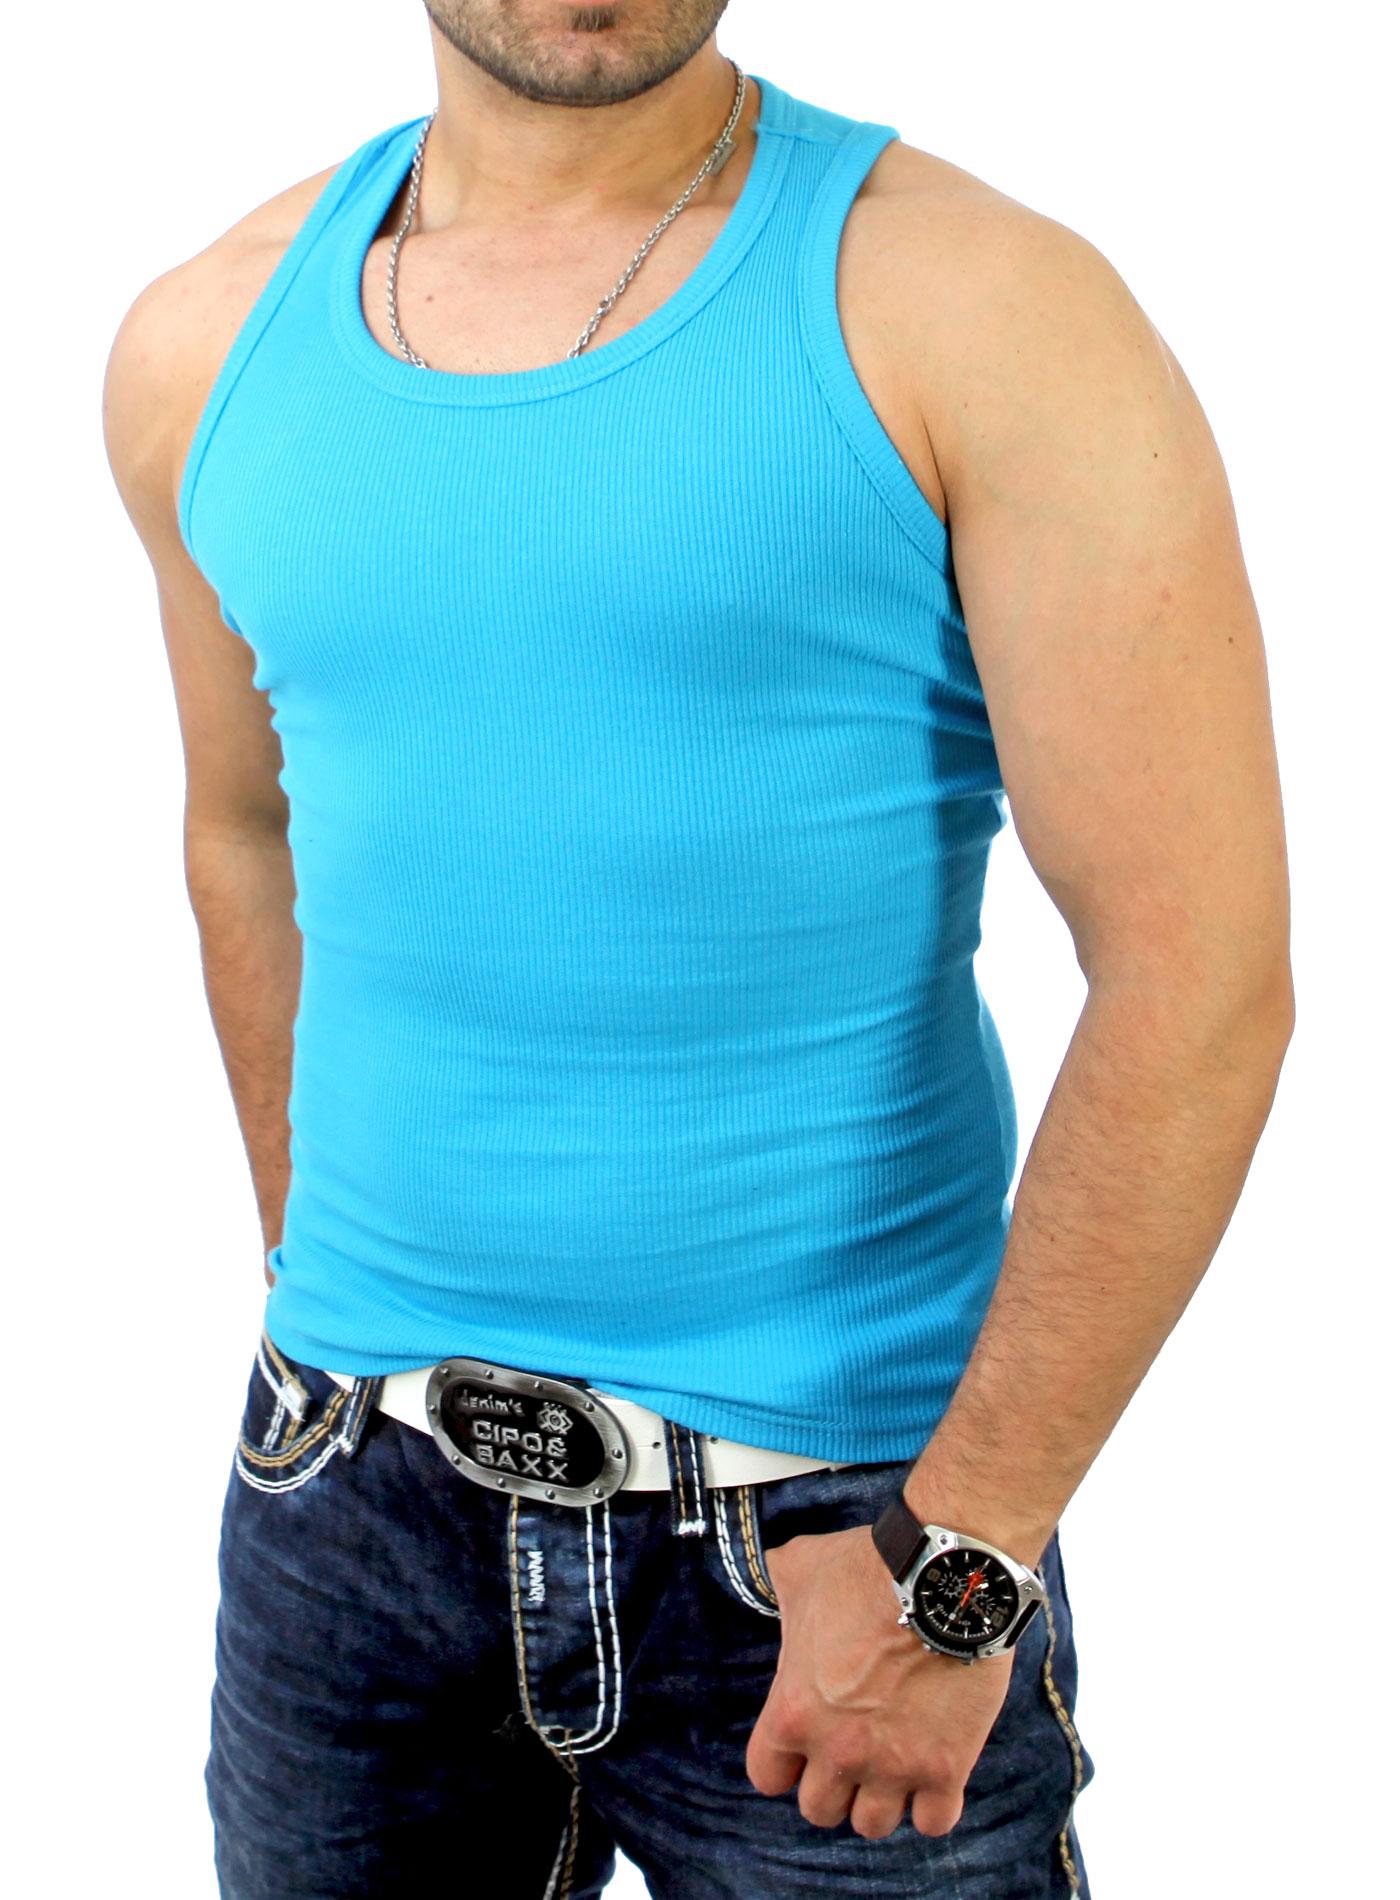 kickdown herren tank top fitness muskel t shirt feinripp hemd muskelshirt k 100 ebay. Black Bedroom Furniture Sets. Home Design Ideas